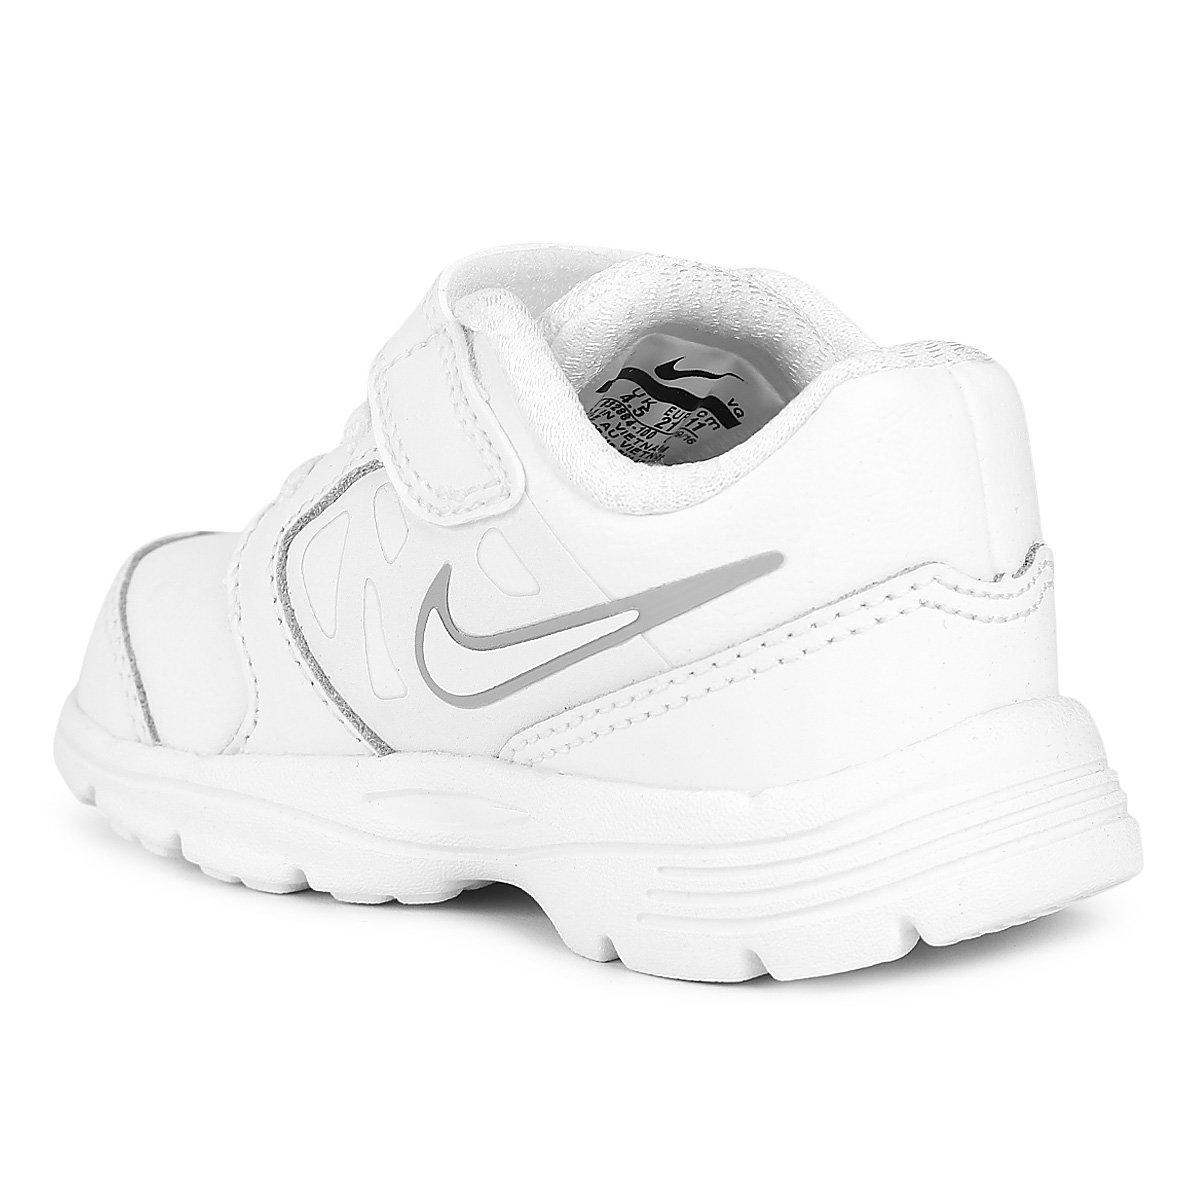 b0488a046 Tênis Infantil Nike Downshifter 6 Ltr Masculino - Compre Agora